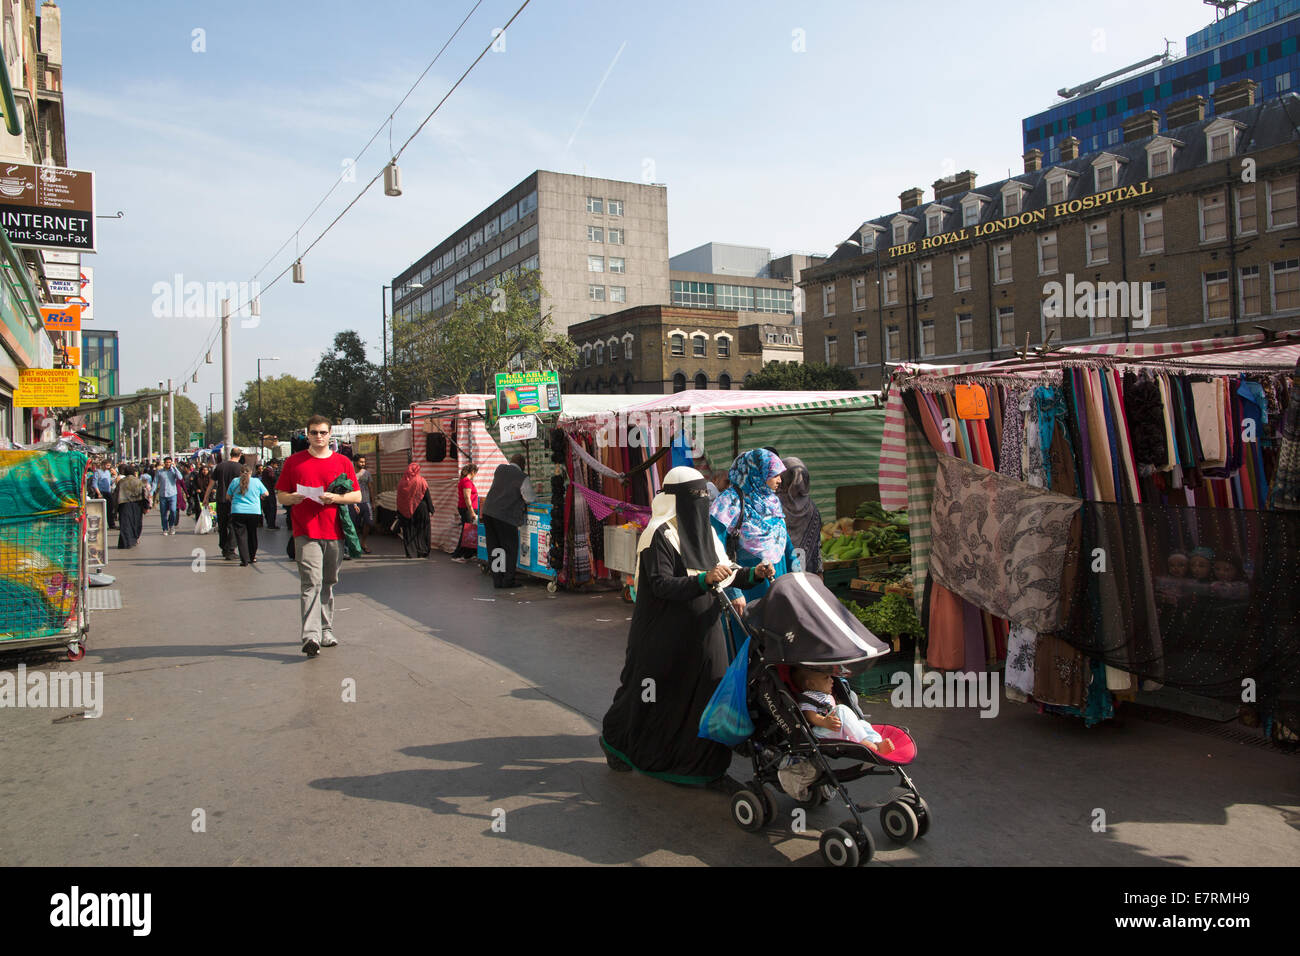 Islamic community, Whitechapel Road, East London, Tower Hamlets, London, England UK - Stock Image